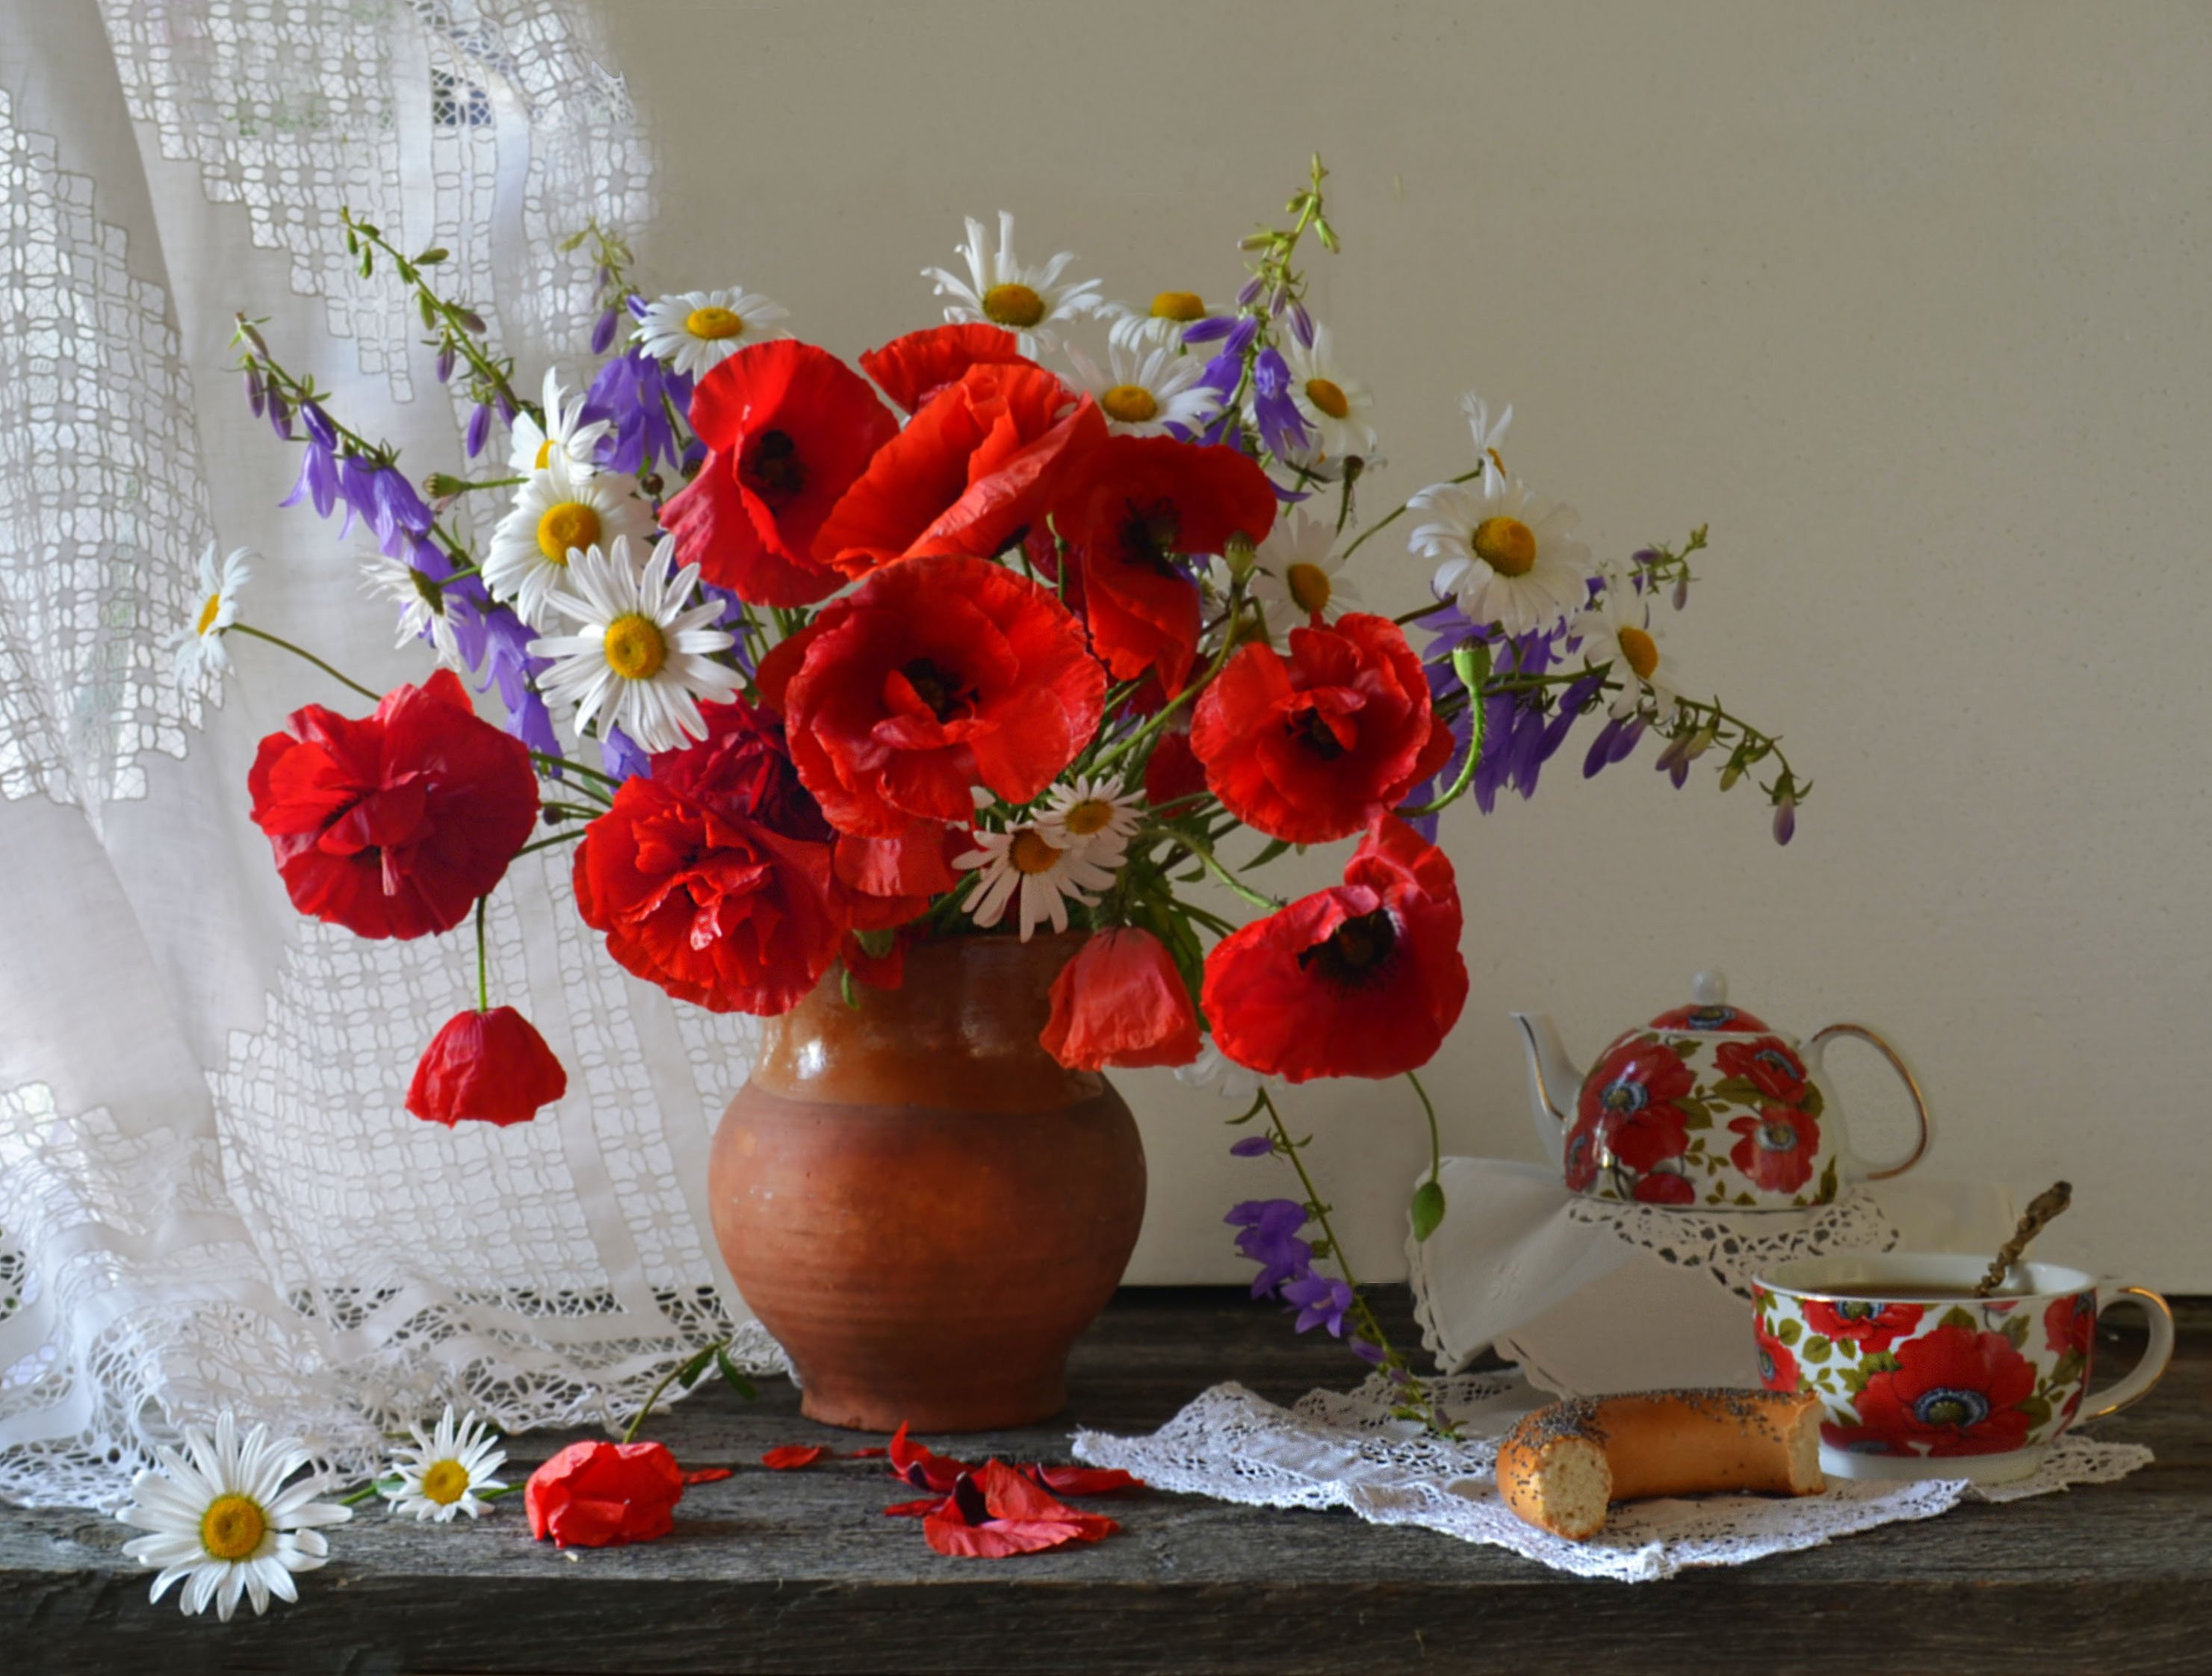 still life, натюрморт, август, колокольчики, кружева, лето, маки,  ромашки, фарфор, фото натюрморт, цветы, Колова Валентина